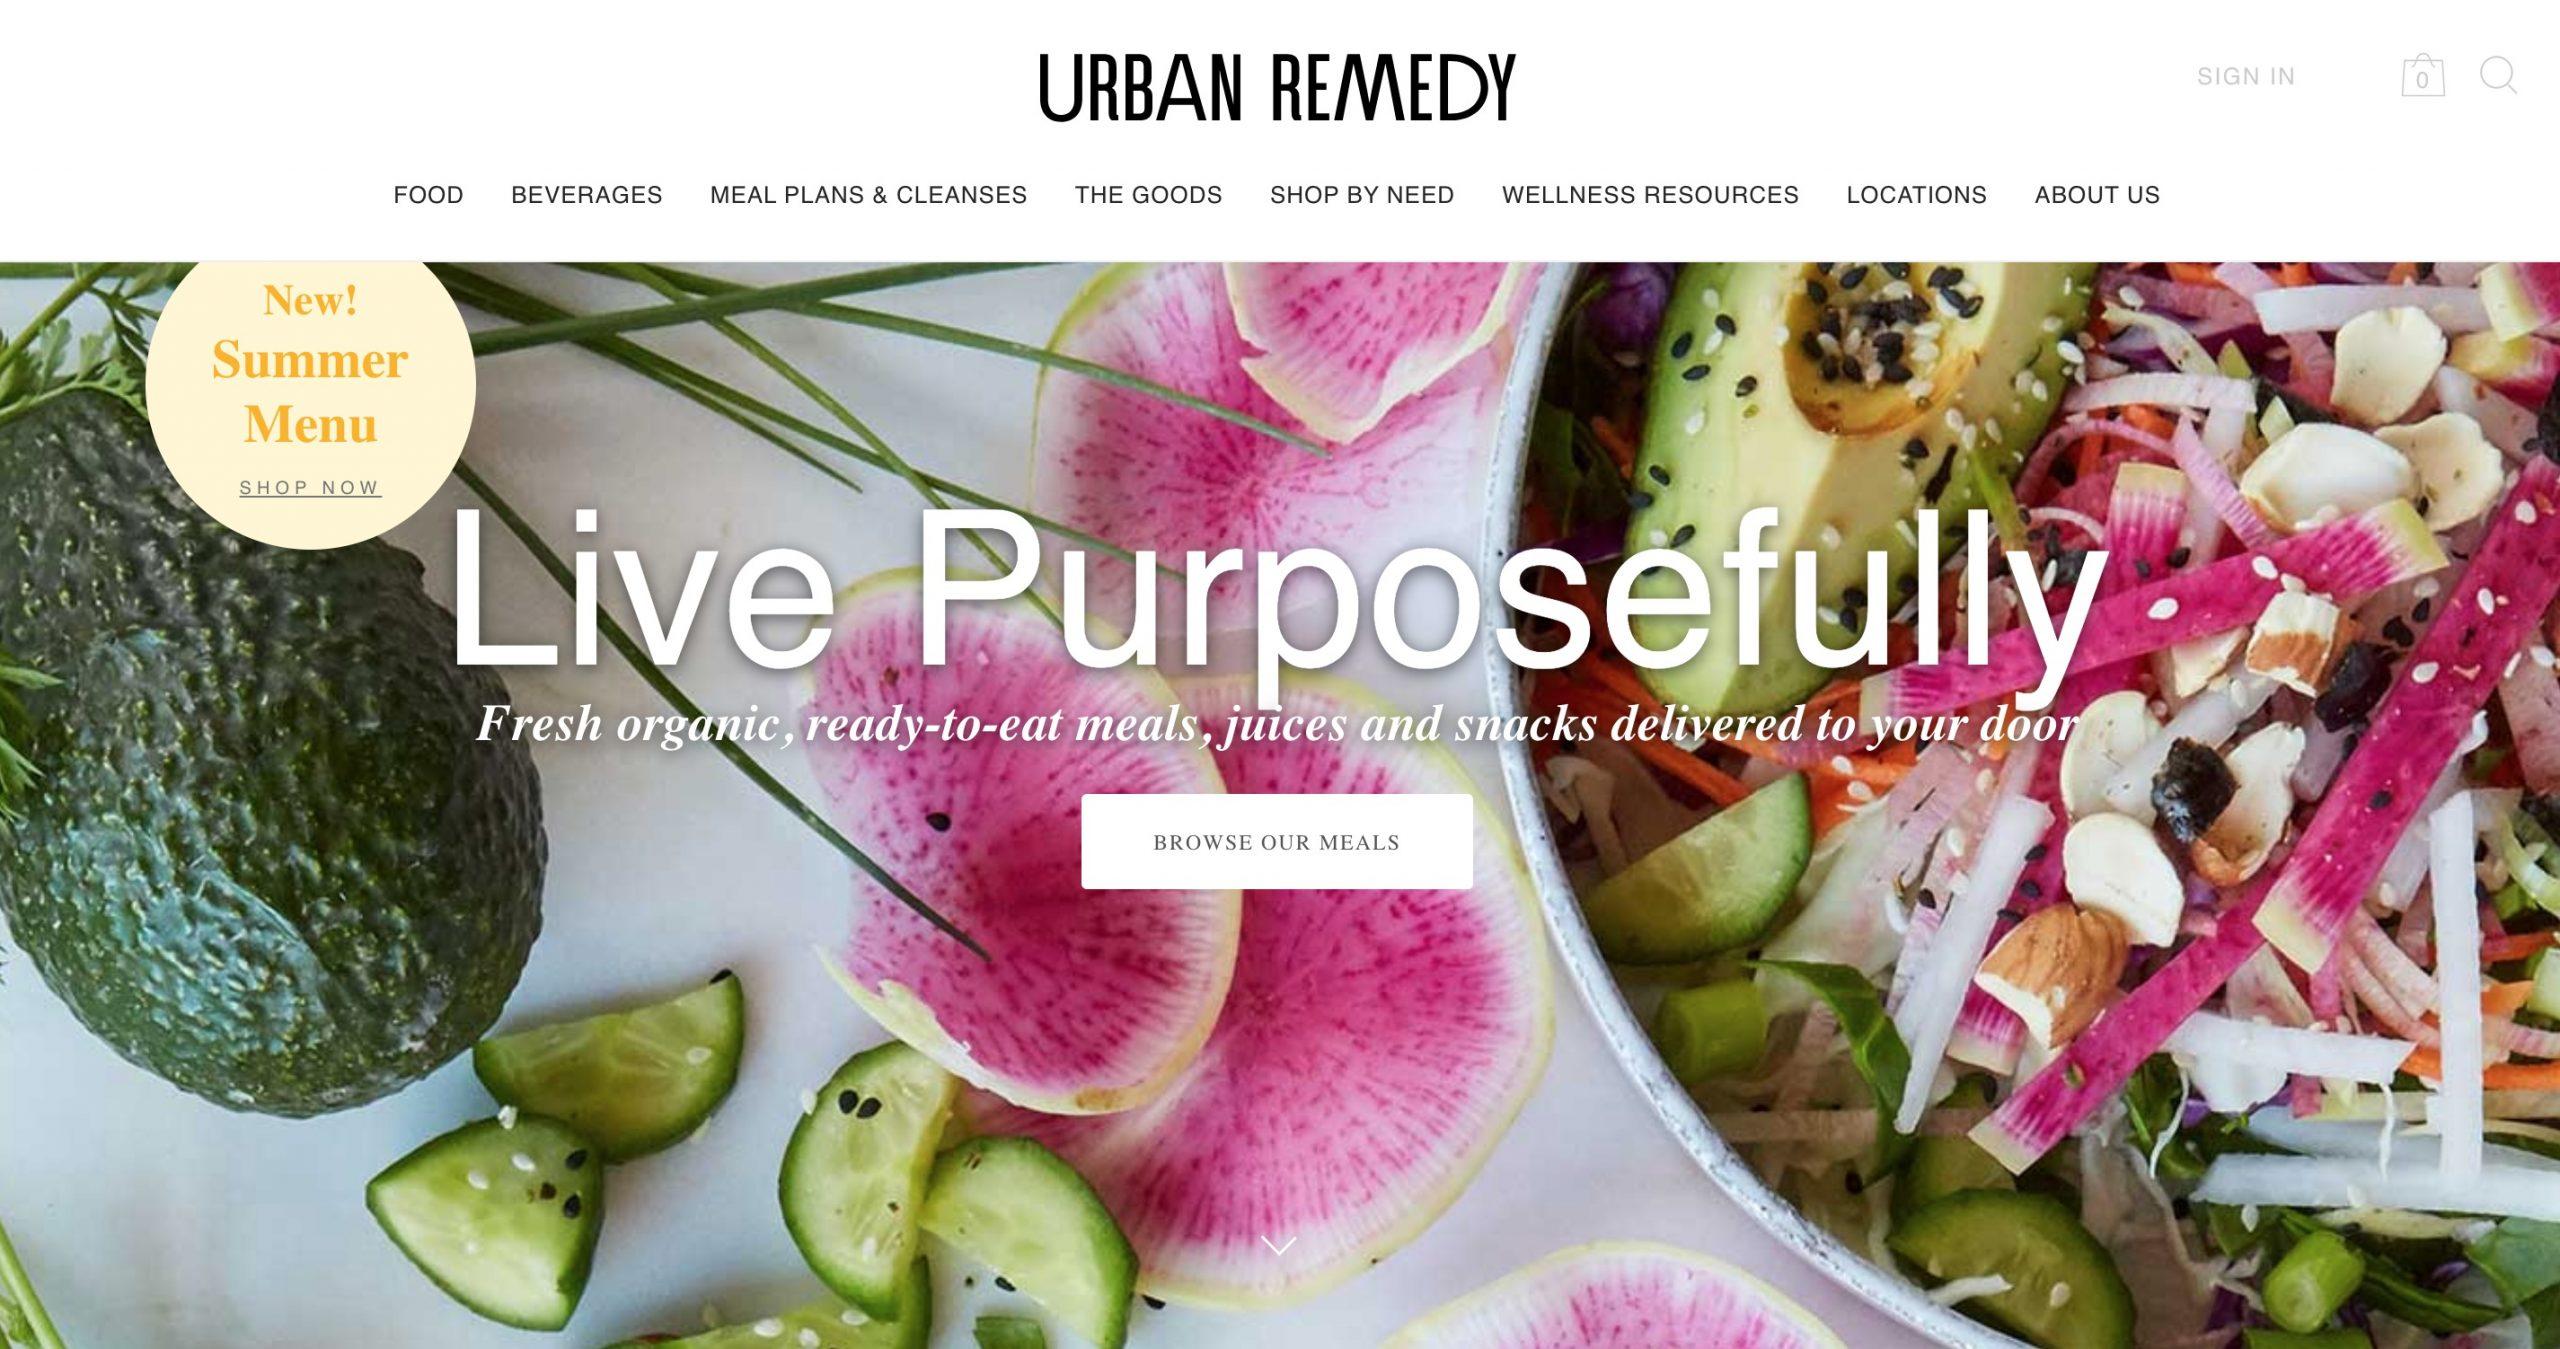 Urban Remedy main page